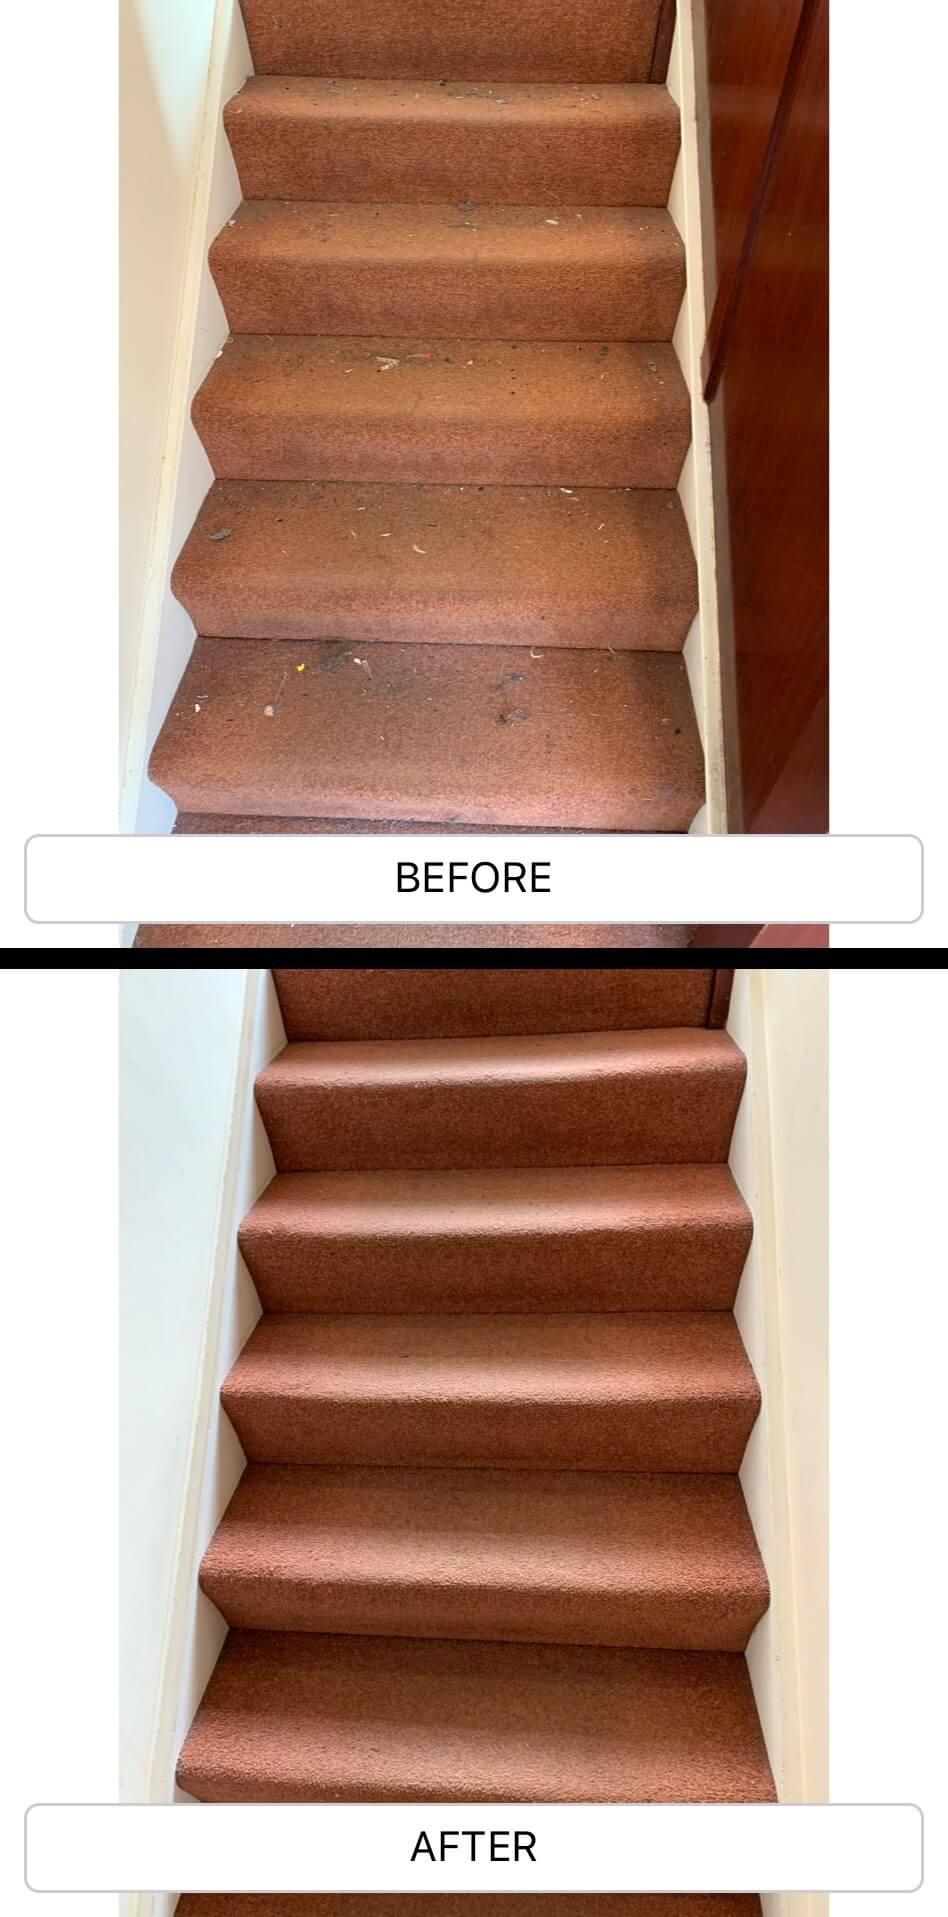 Carpet Cleaning Wimbledon SW19